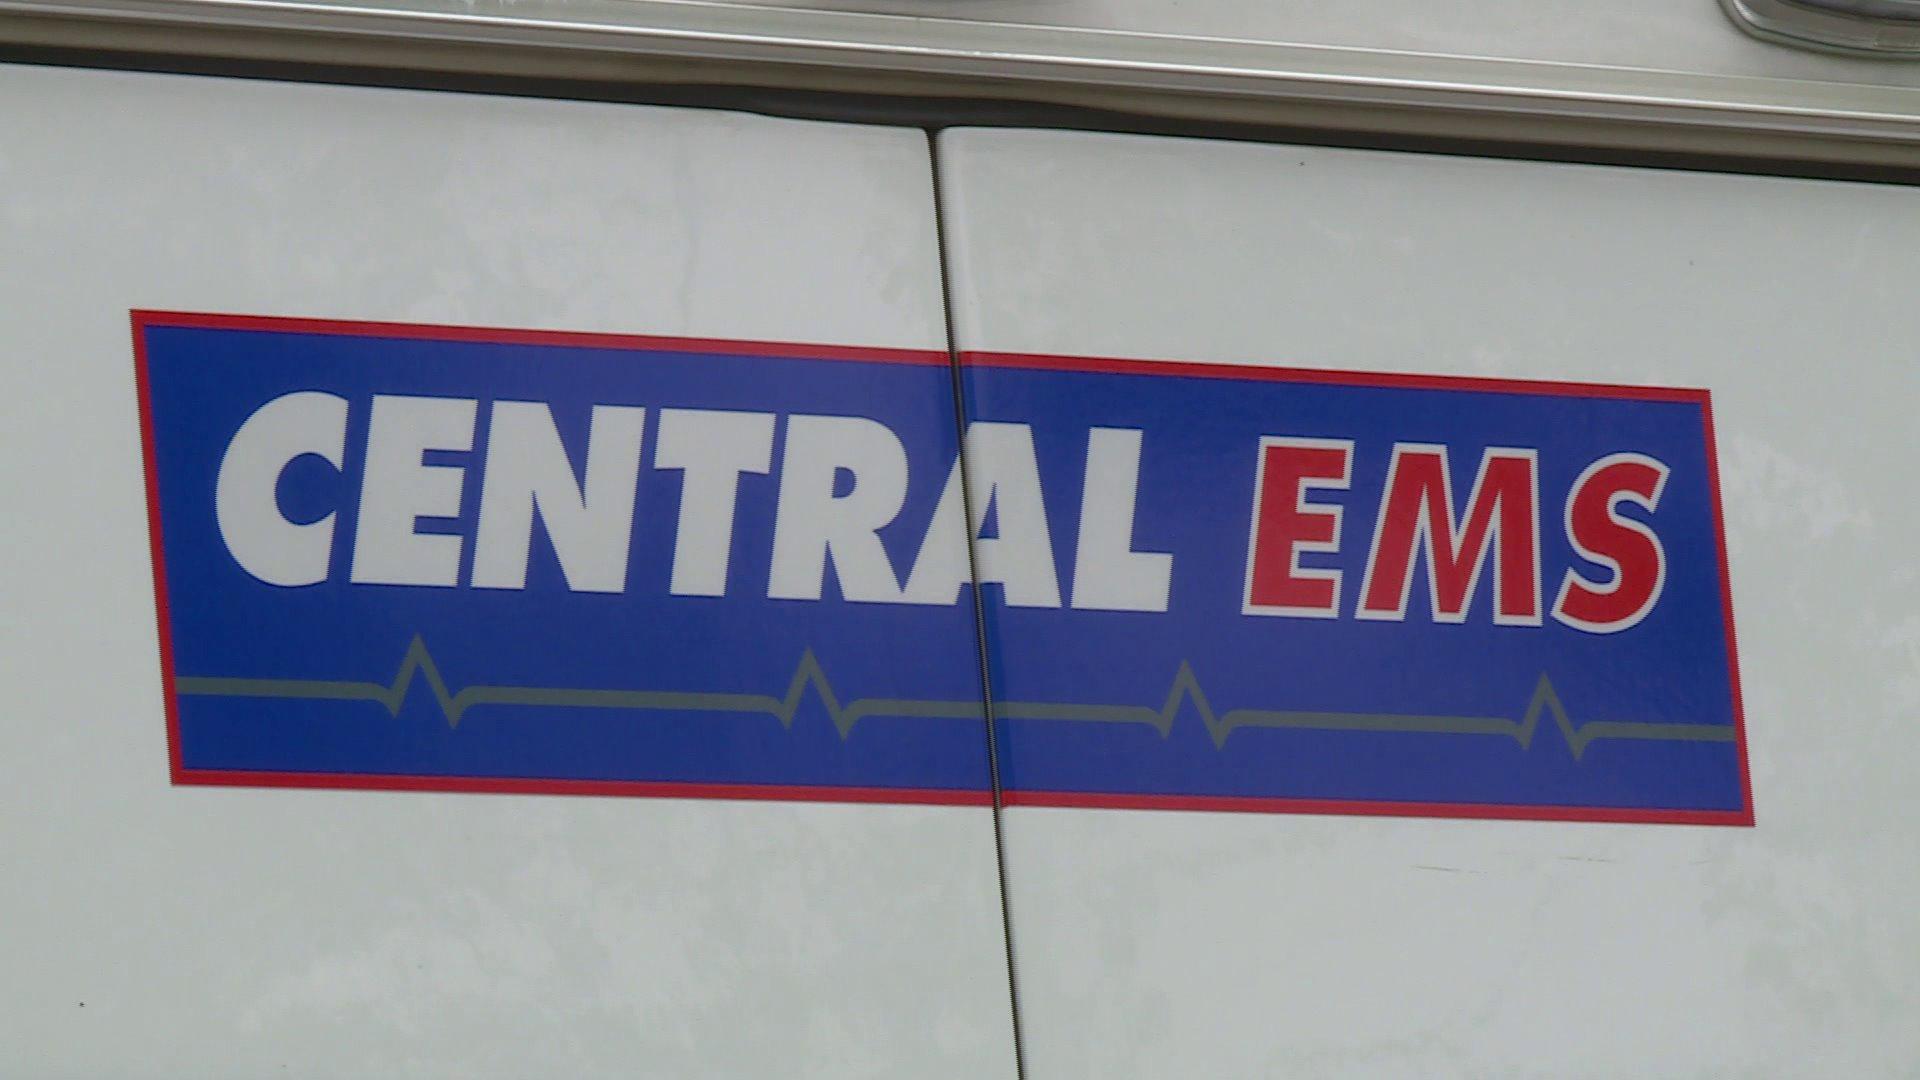 central-ems